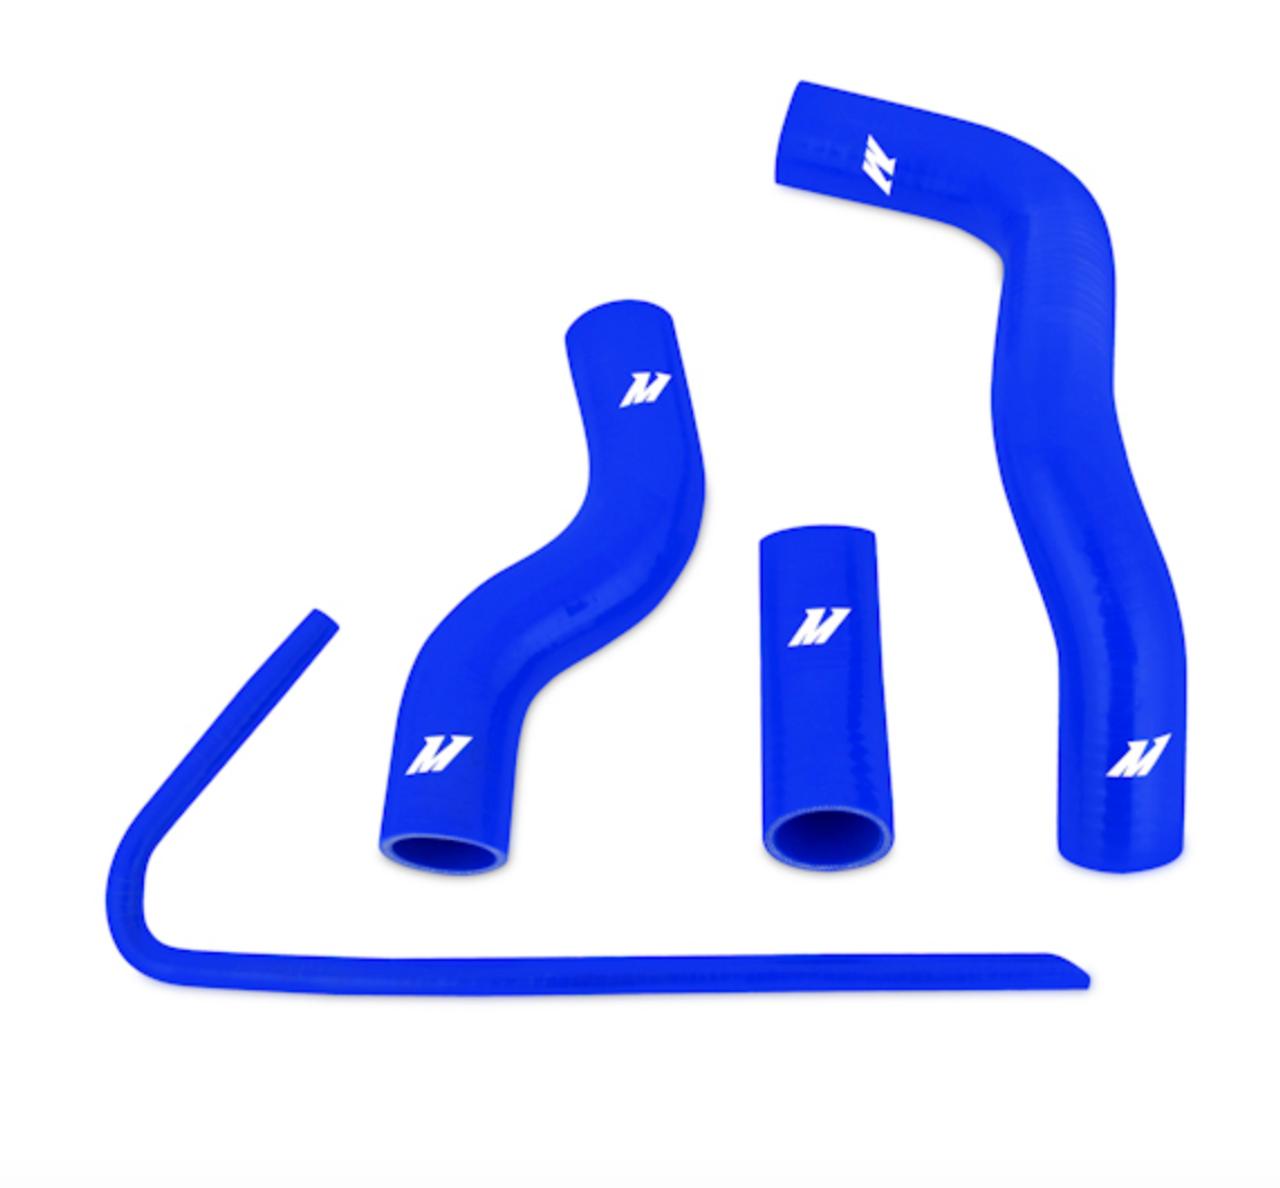 Mishimoto Silicone Radiator Hose Kit for Subaru BRZ, Scion FRS